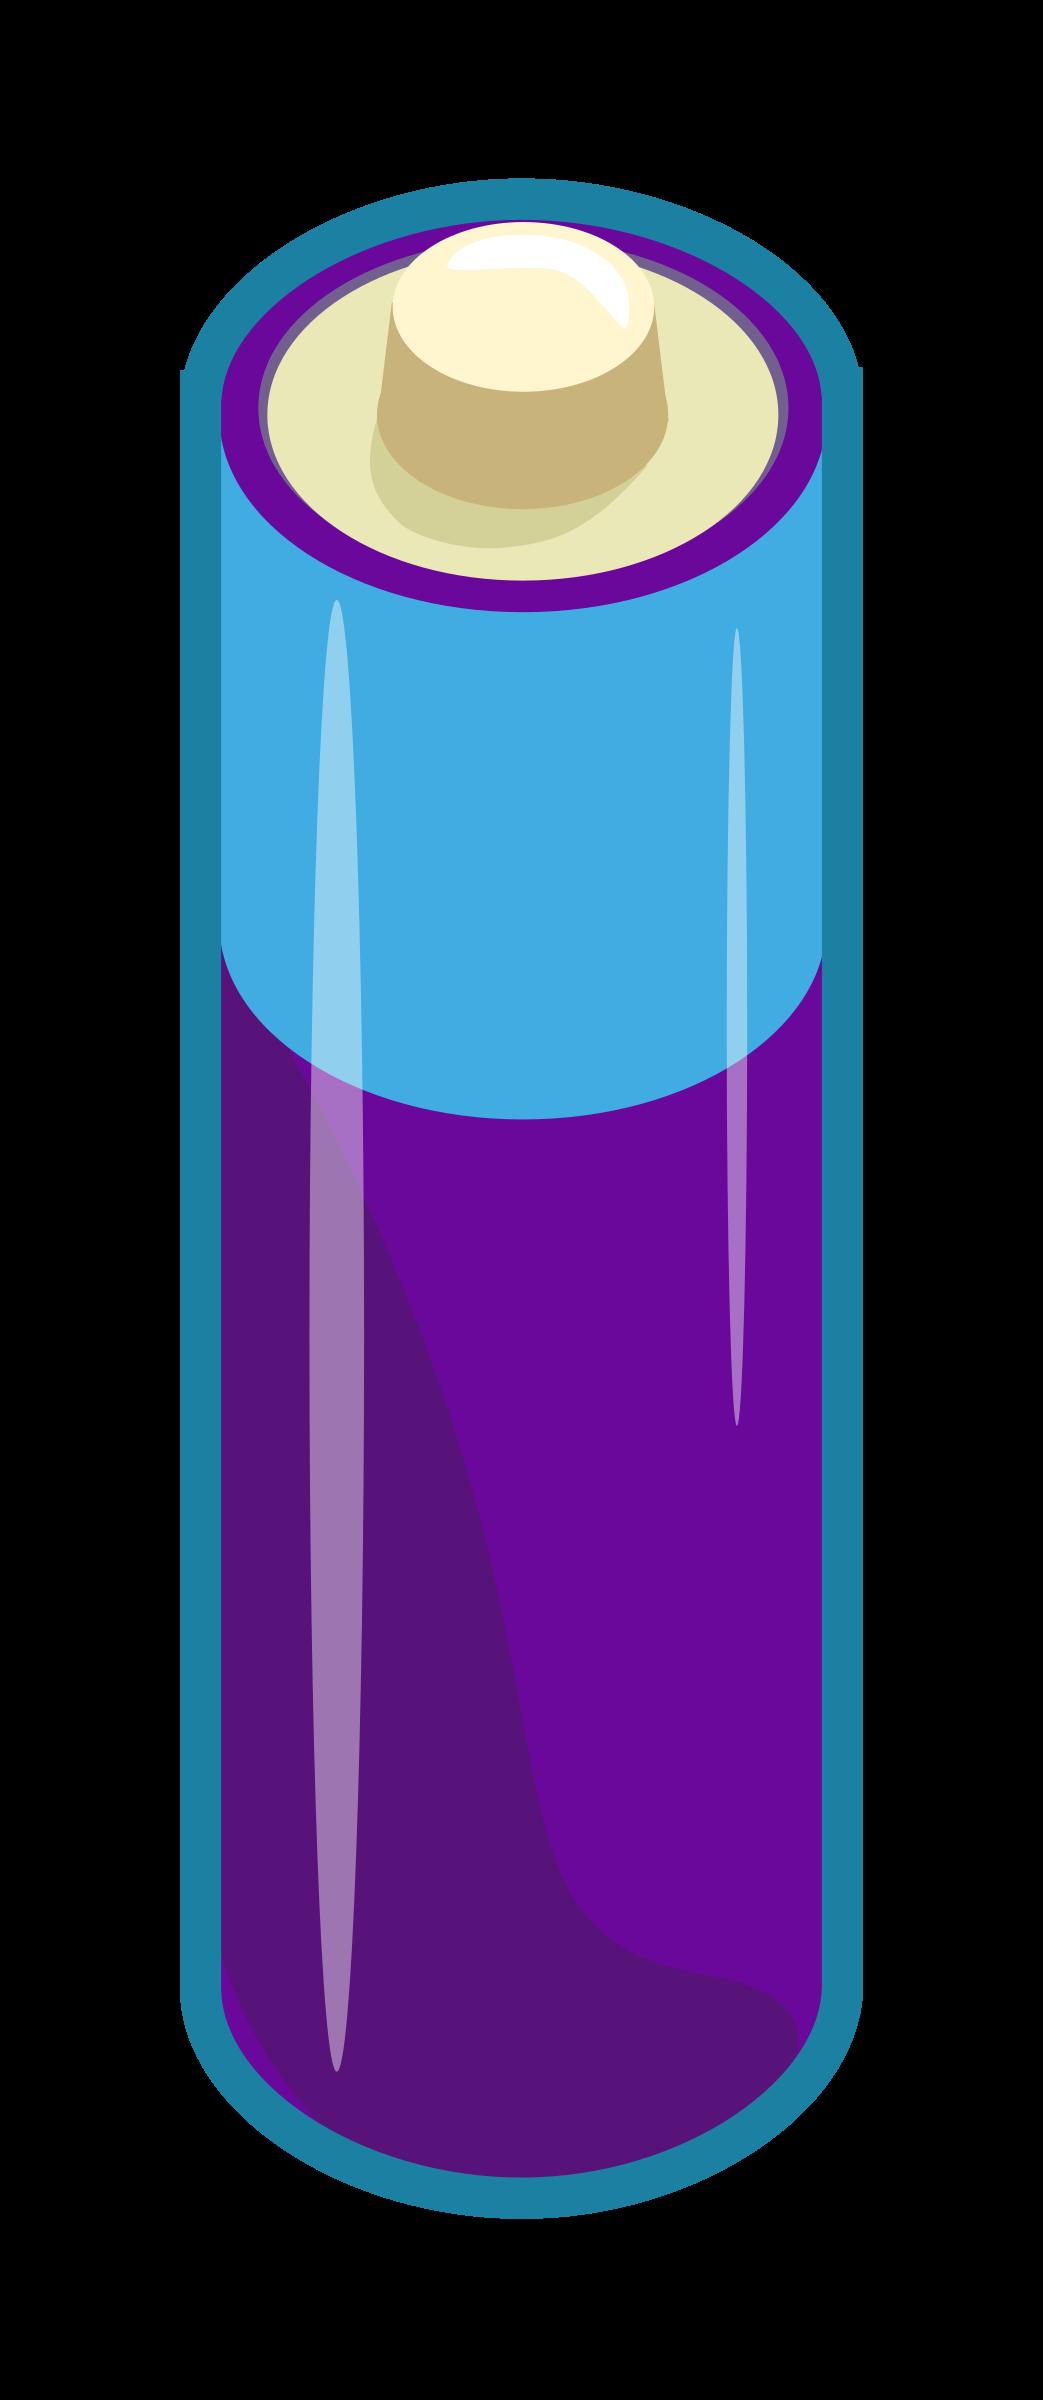 Clipart Pila